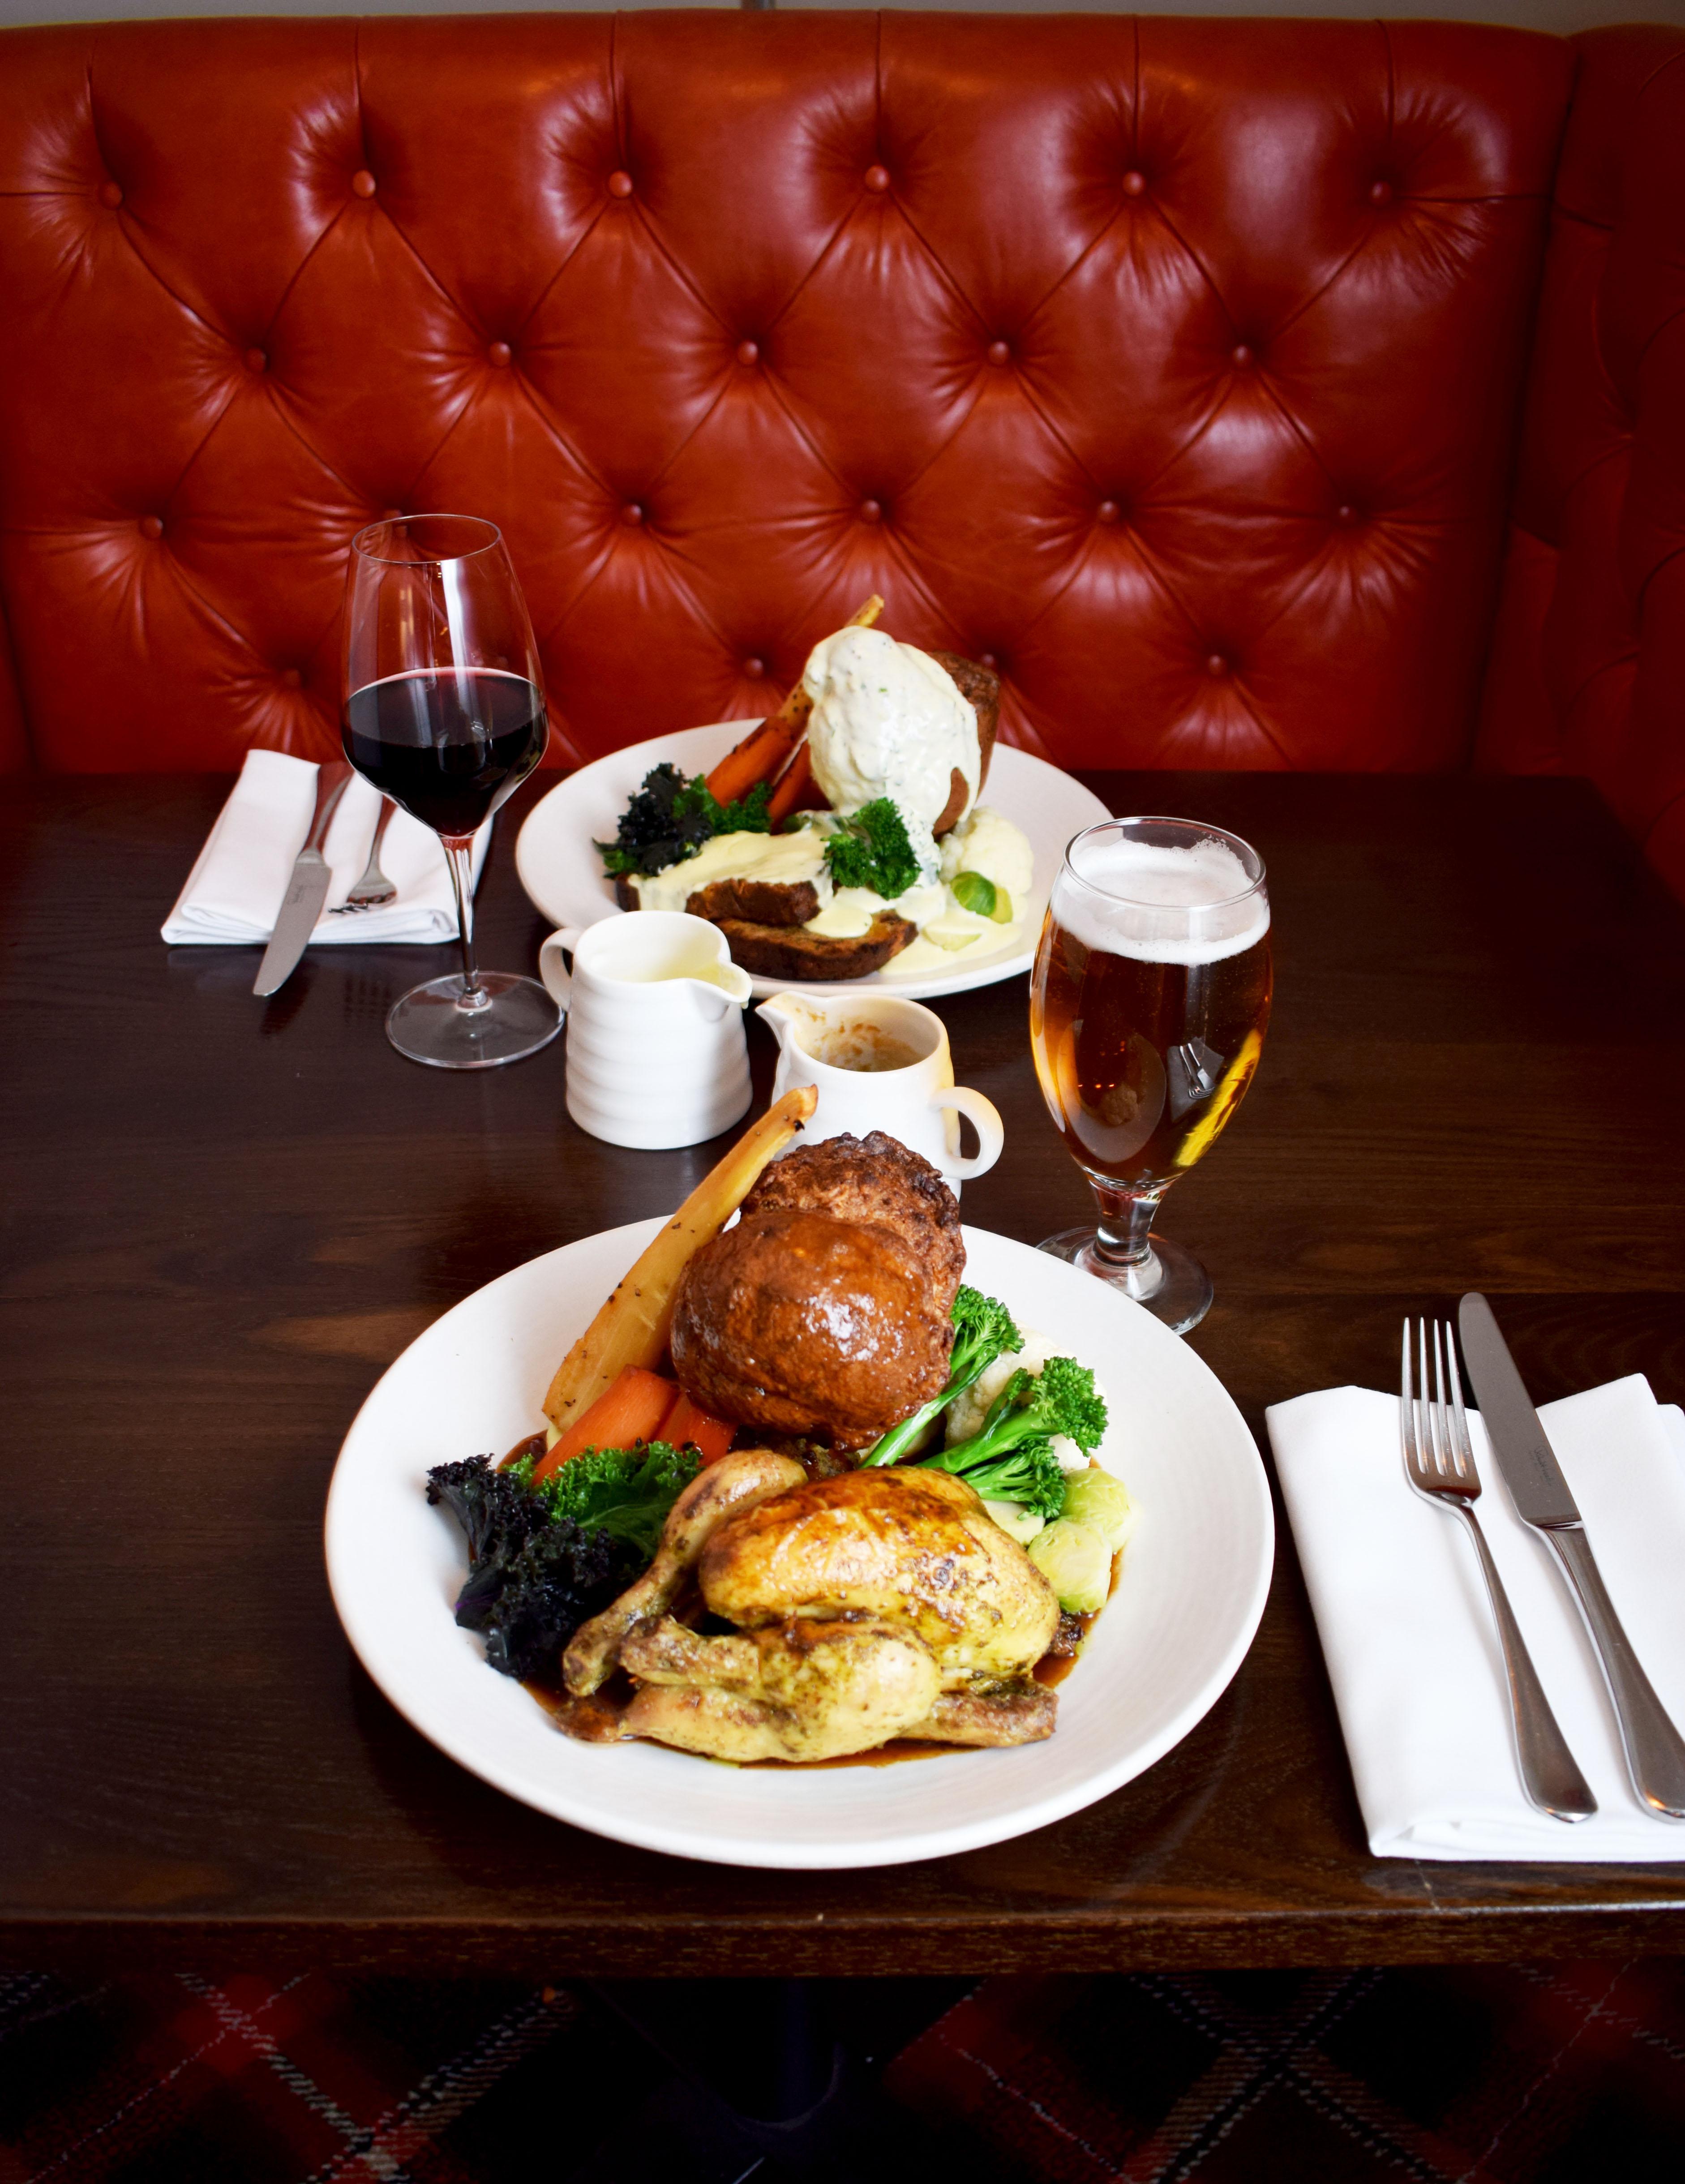 nut-roast-and-roast-chicken-in-red-booth-photo-by-bernardo-fernandes-2